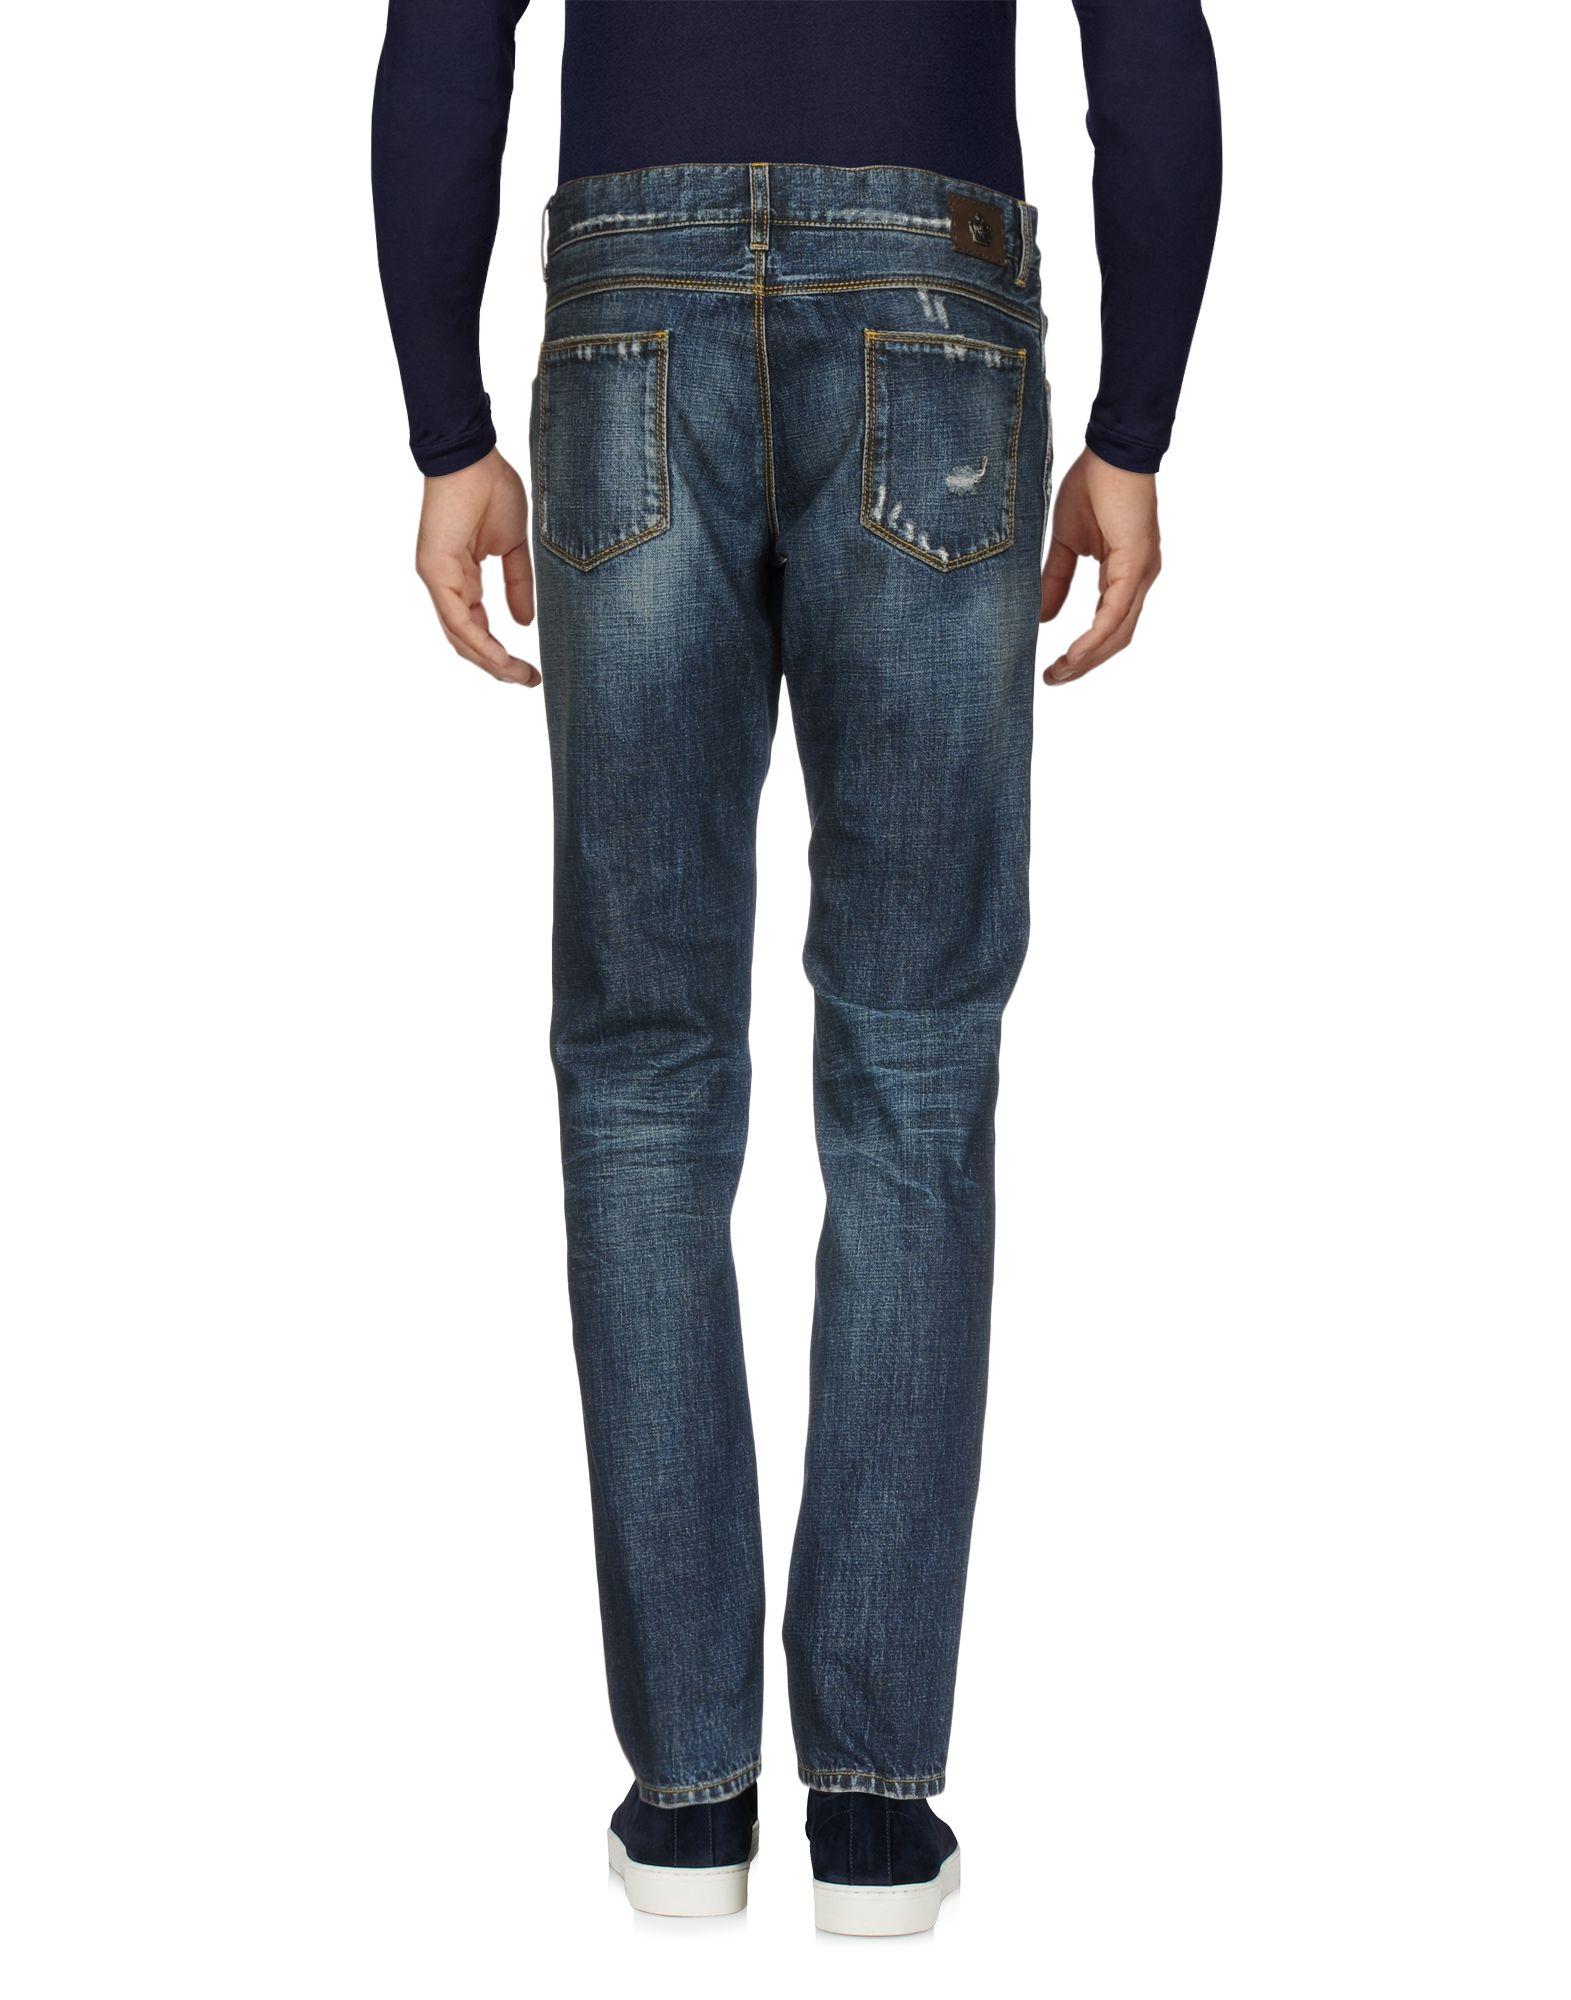 Pantaloni Jeans Dolce & Gabbana Uomo - 42670941HM 42670941HM - 4da604